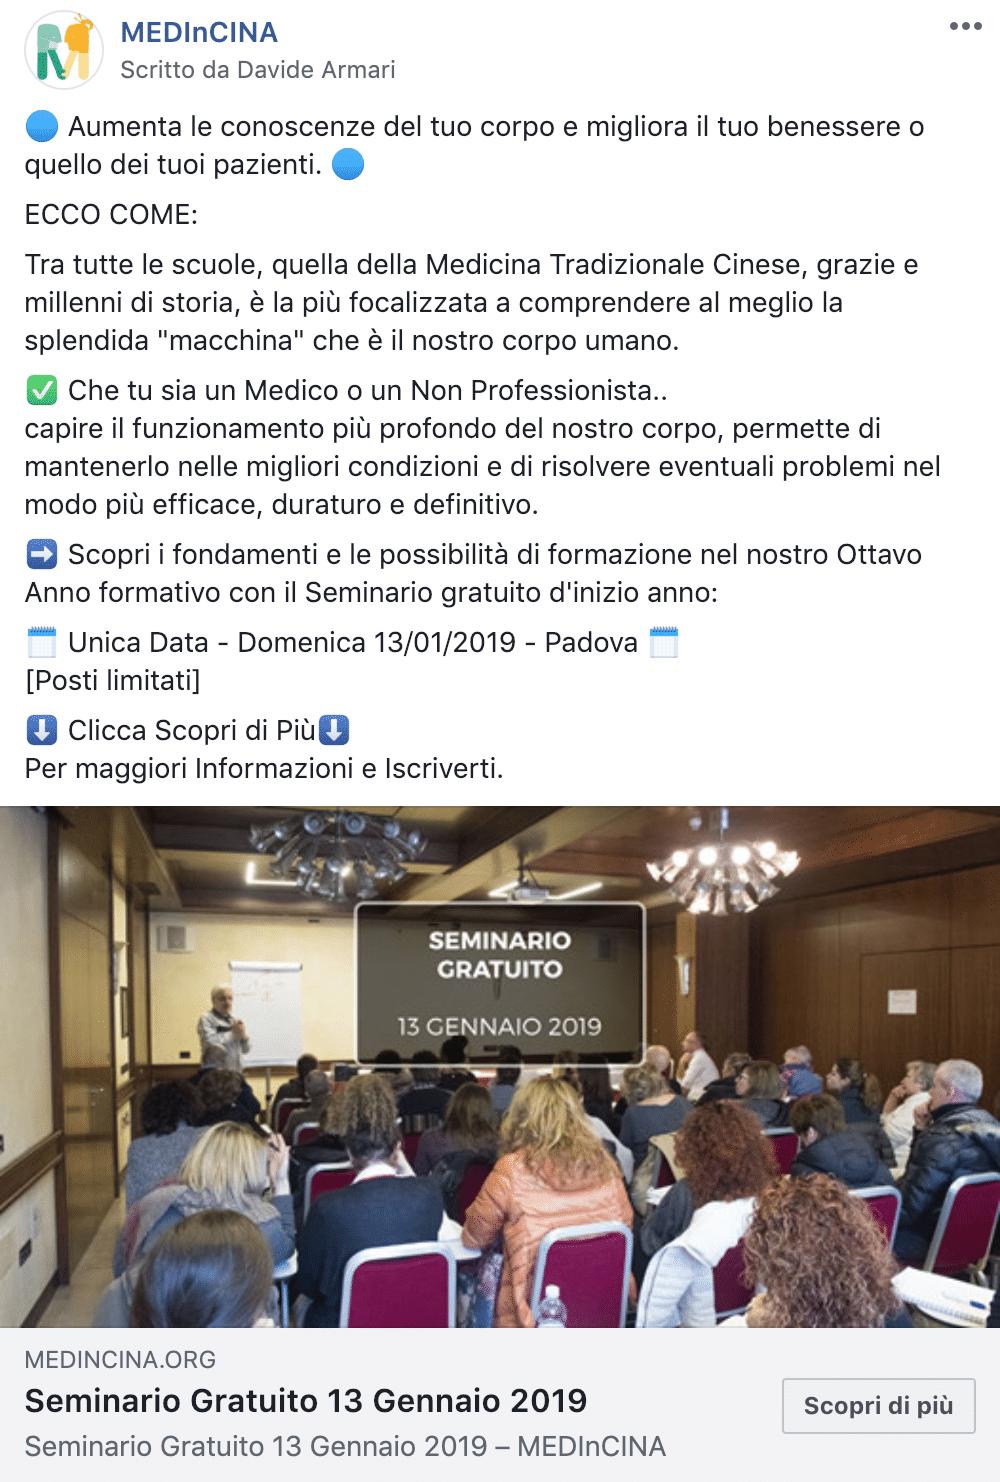 Esempio EventoPagina Facebook: MEDInCINA